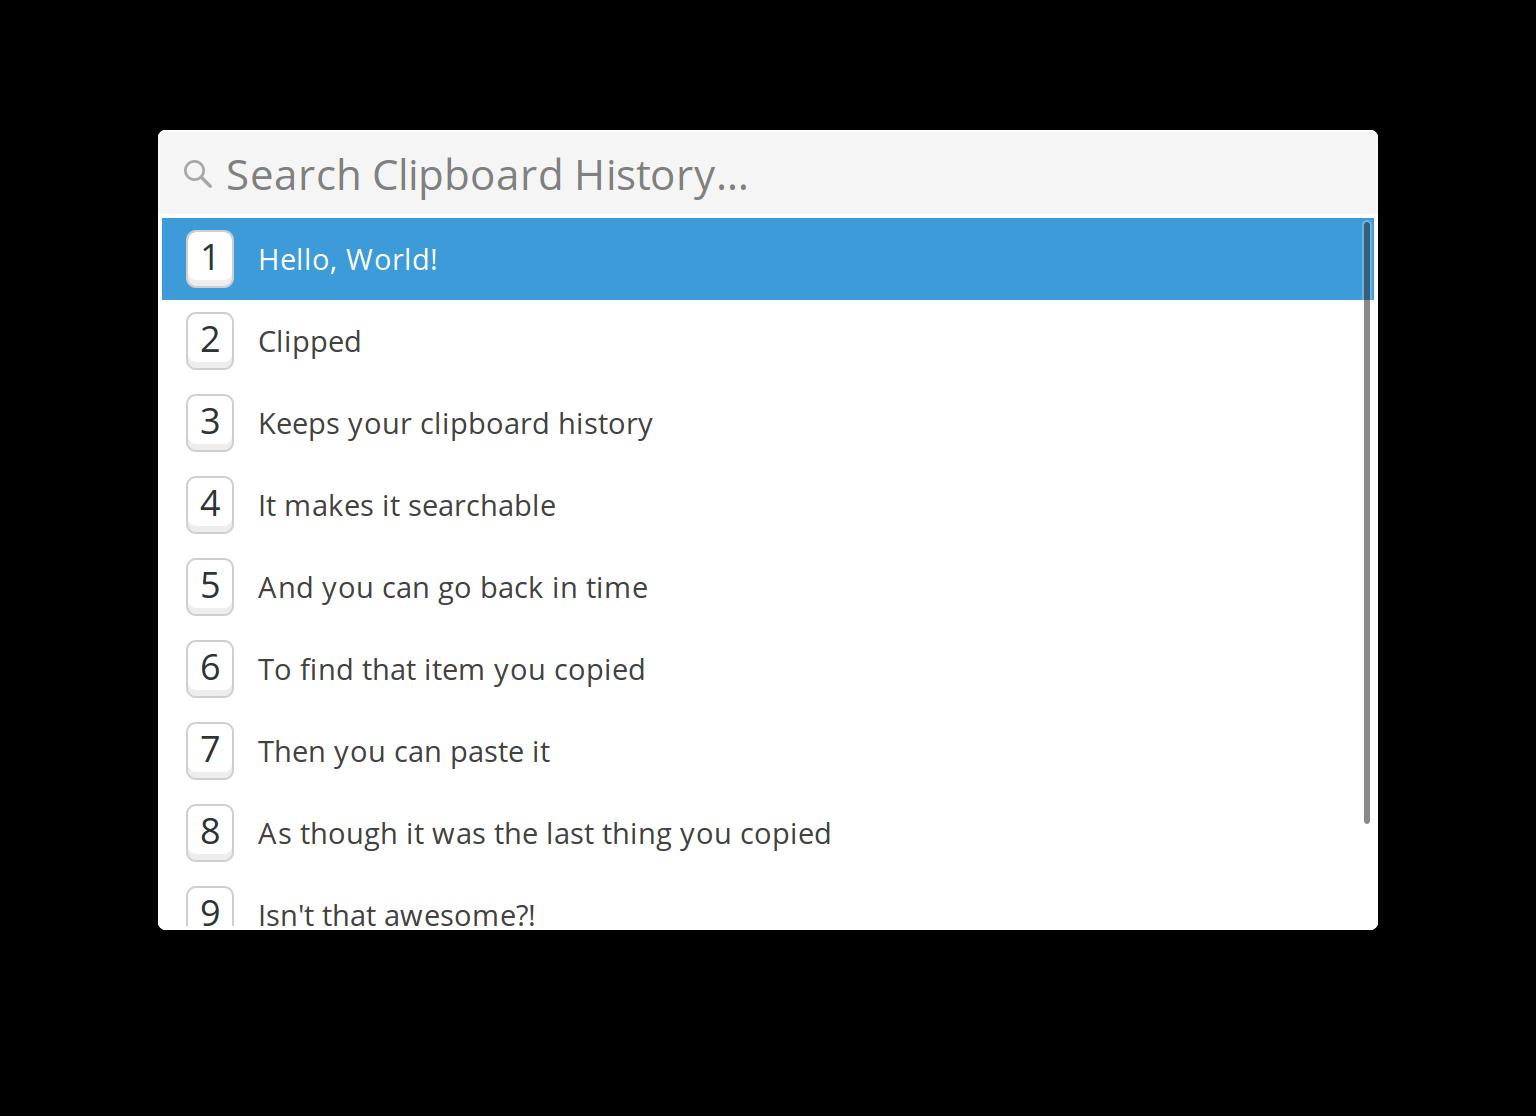 Clipped Screenshot